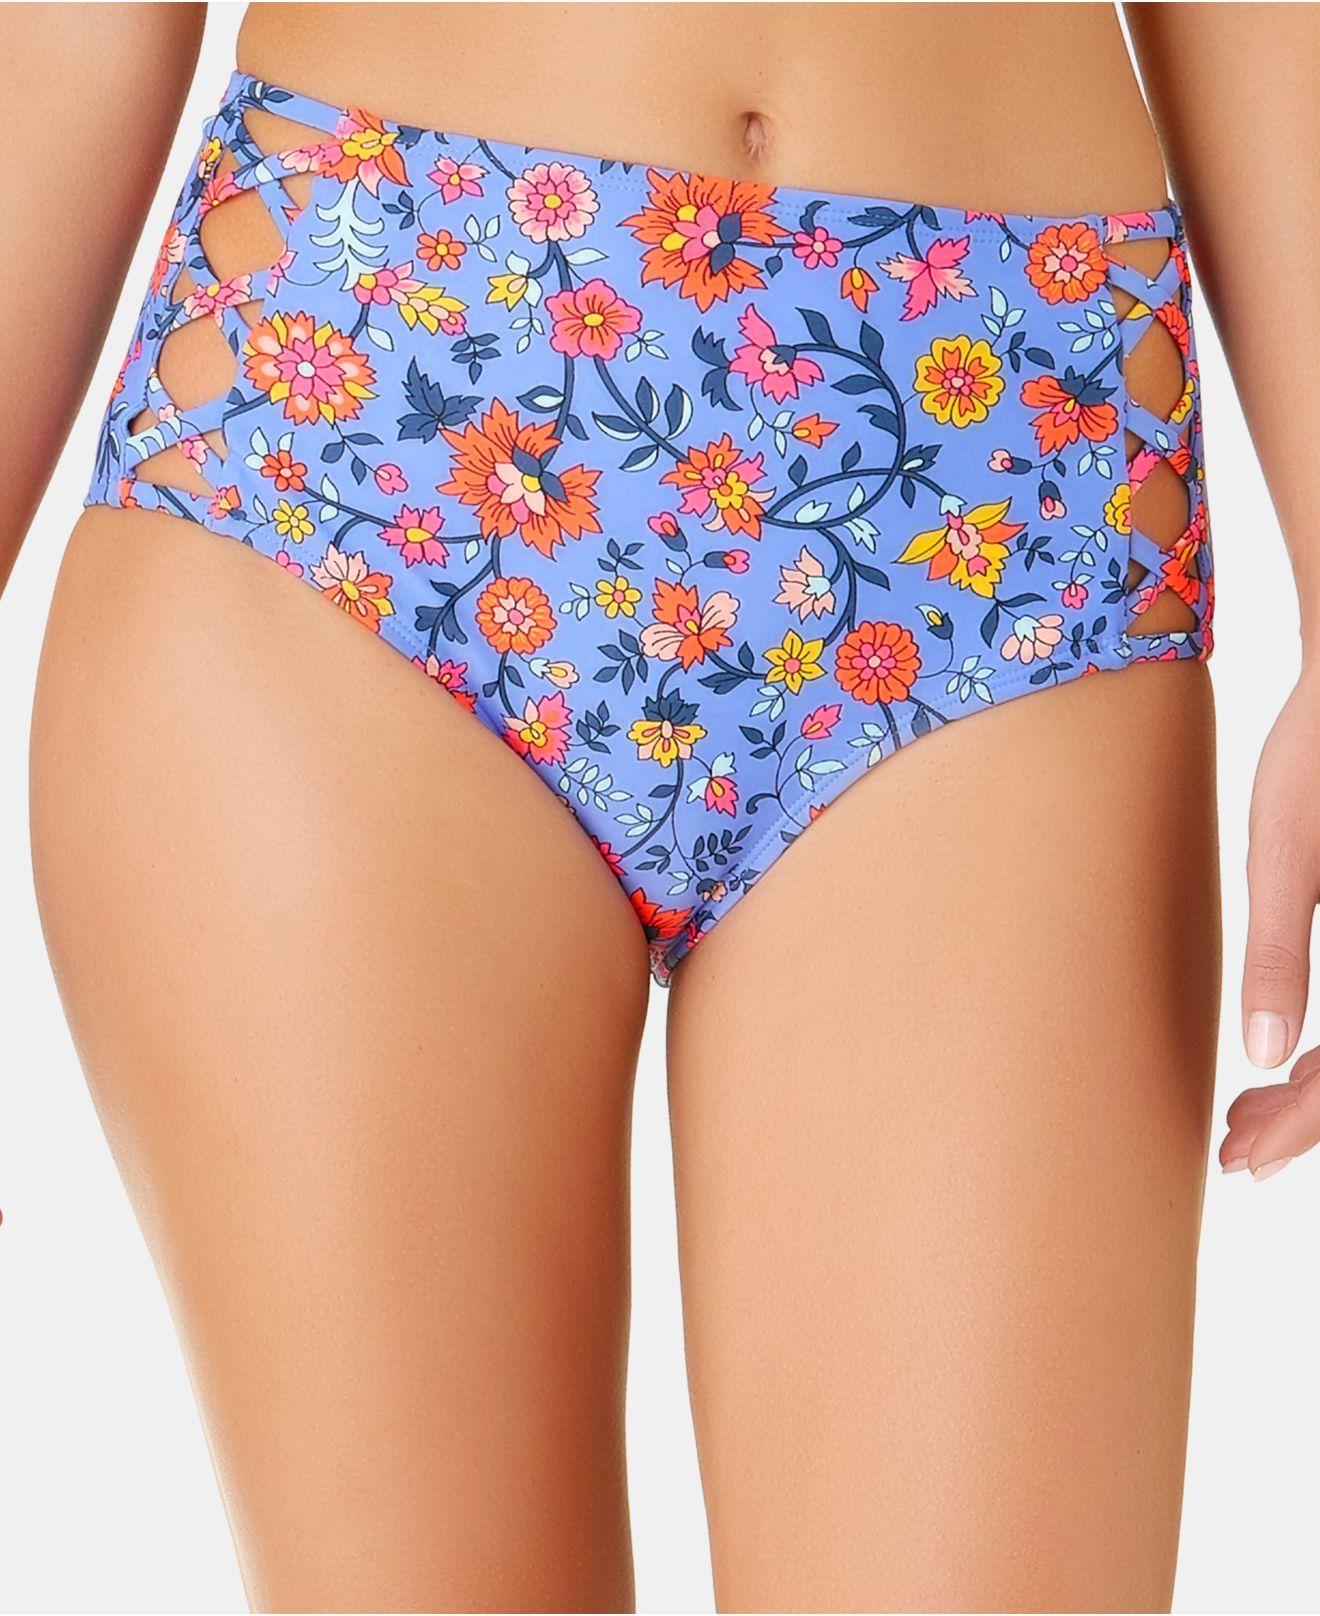 fe75a600f0 California Waves. Women's Blue Juniors' C'est La Vie Printed Strappy High  Waist Bottoms ...